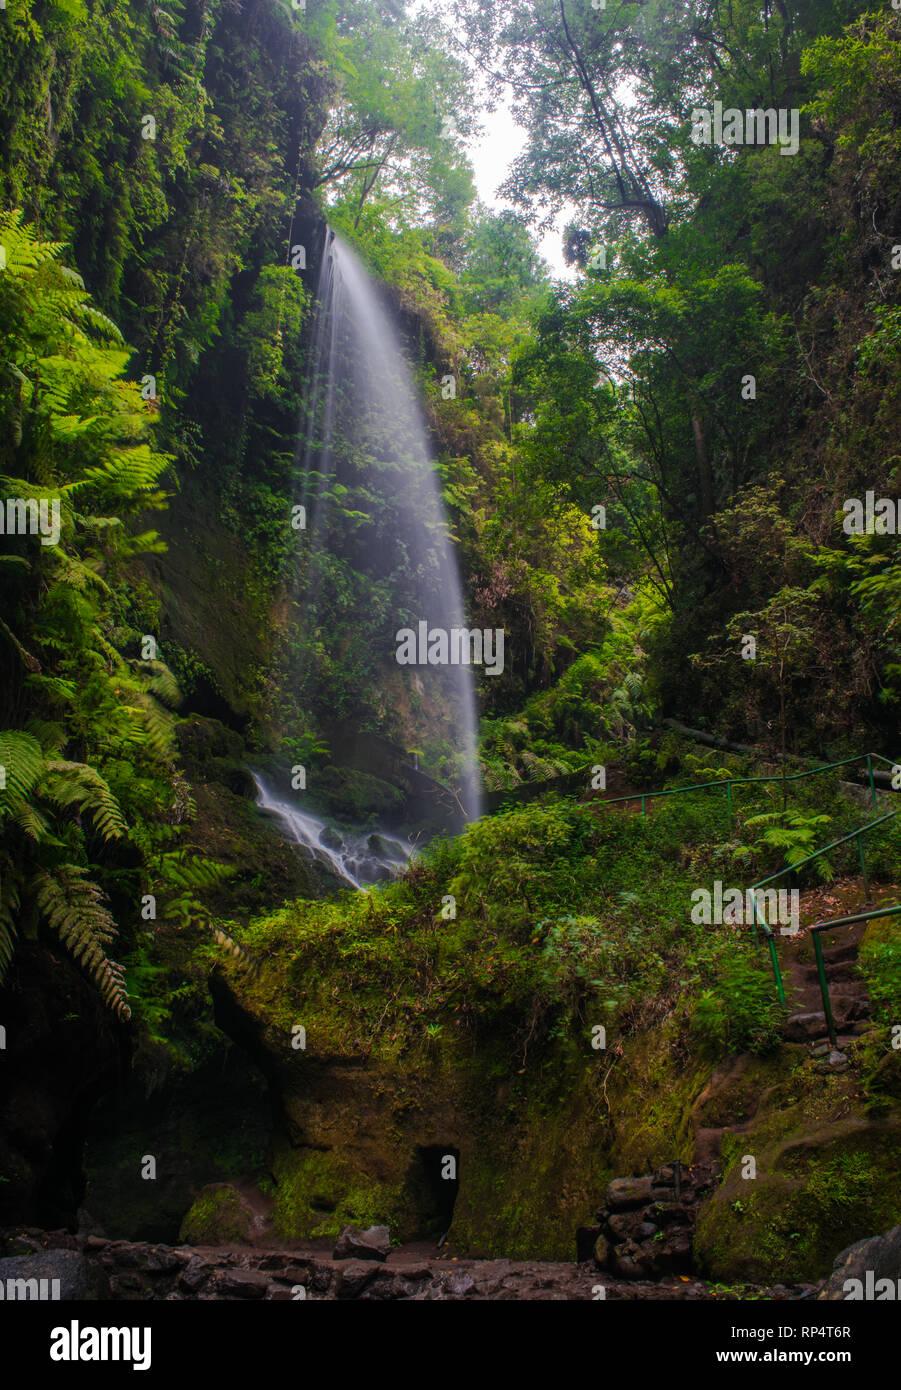 Los Tilos Wasserfall, San Andres y Sauces, La Palma, Kanarische Inseln, Spanien Stockbild